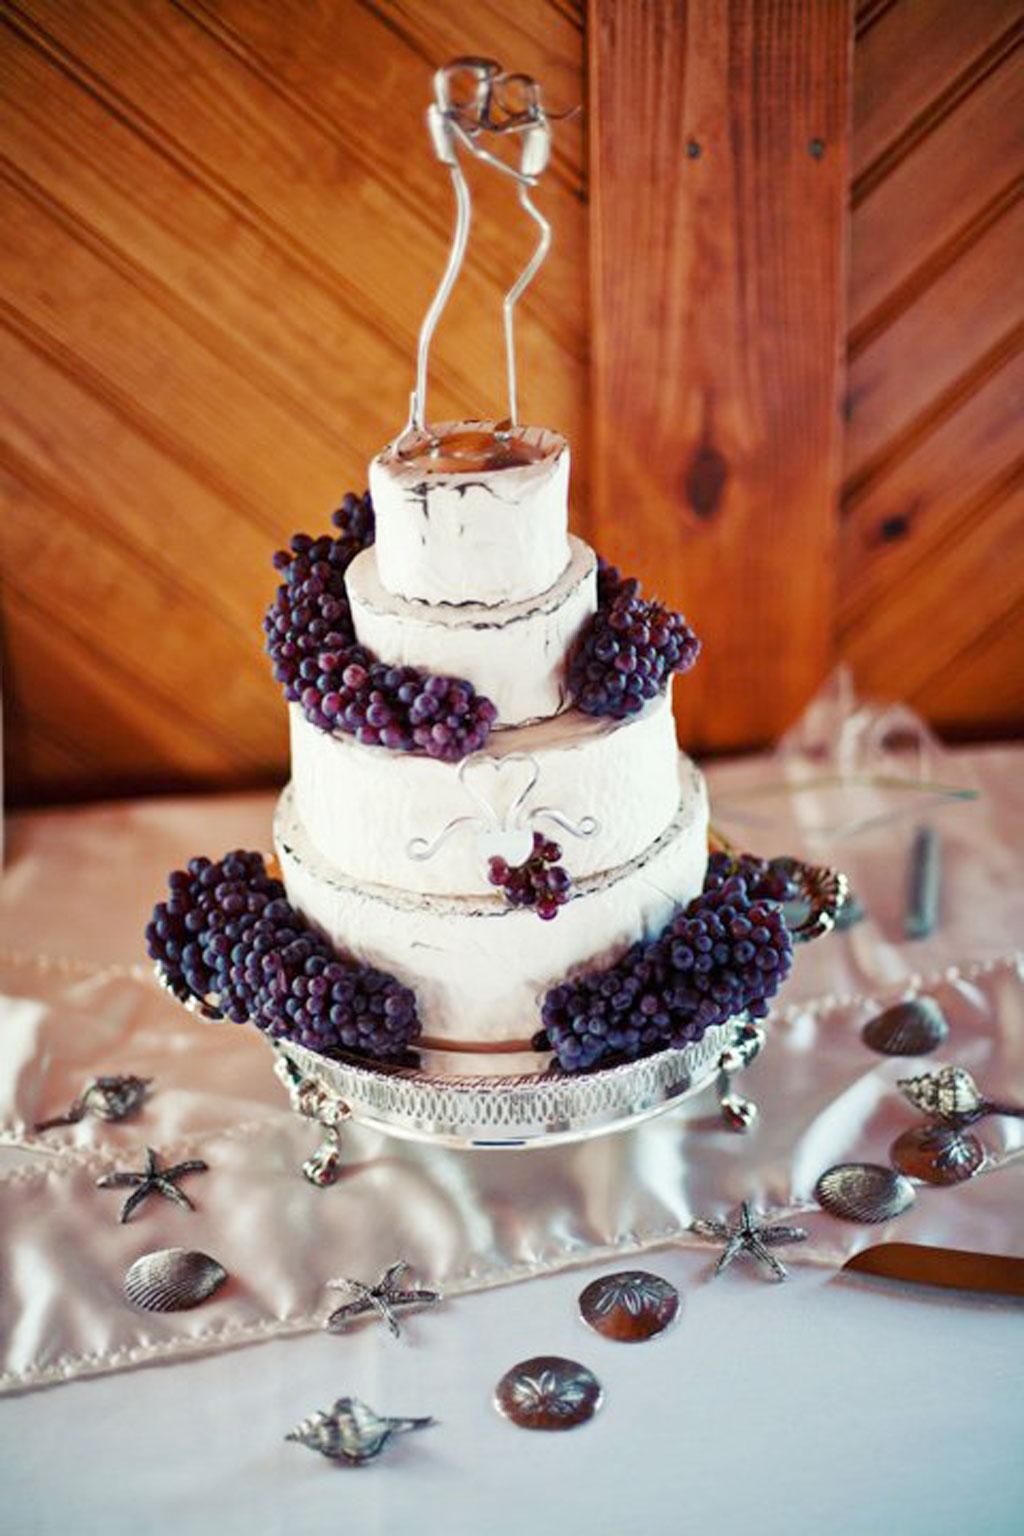 Harris Teeter Wedding Cakes 4 Picture In Cake